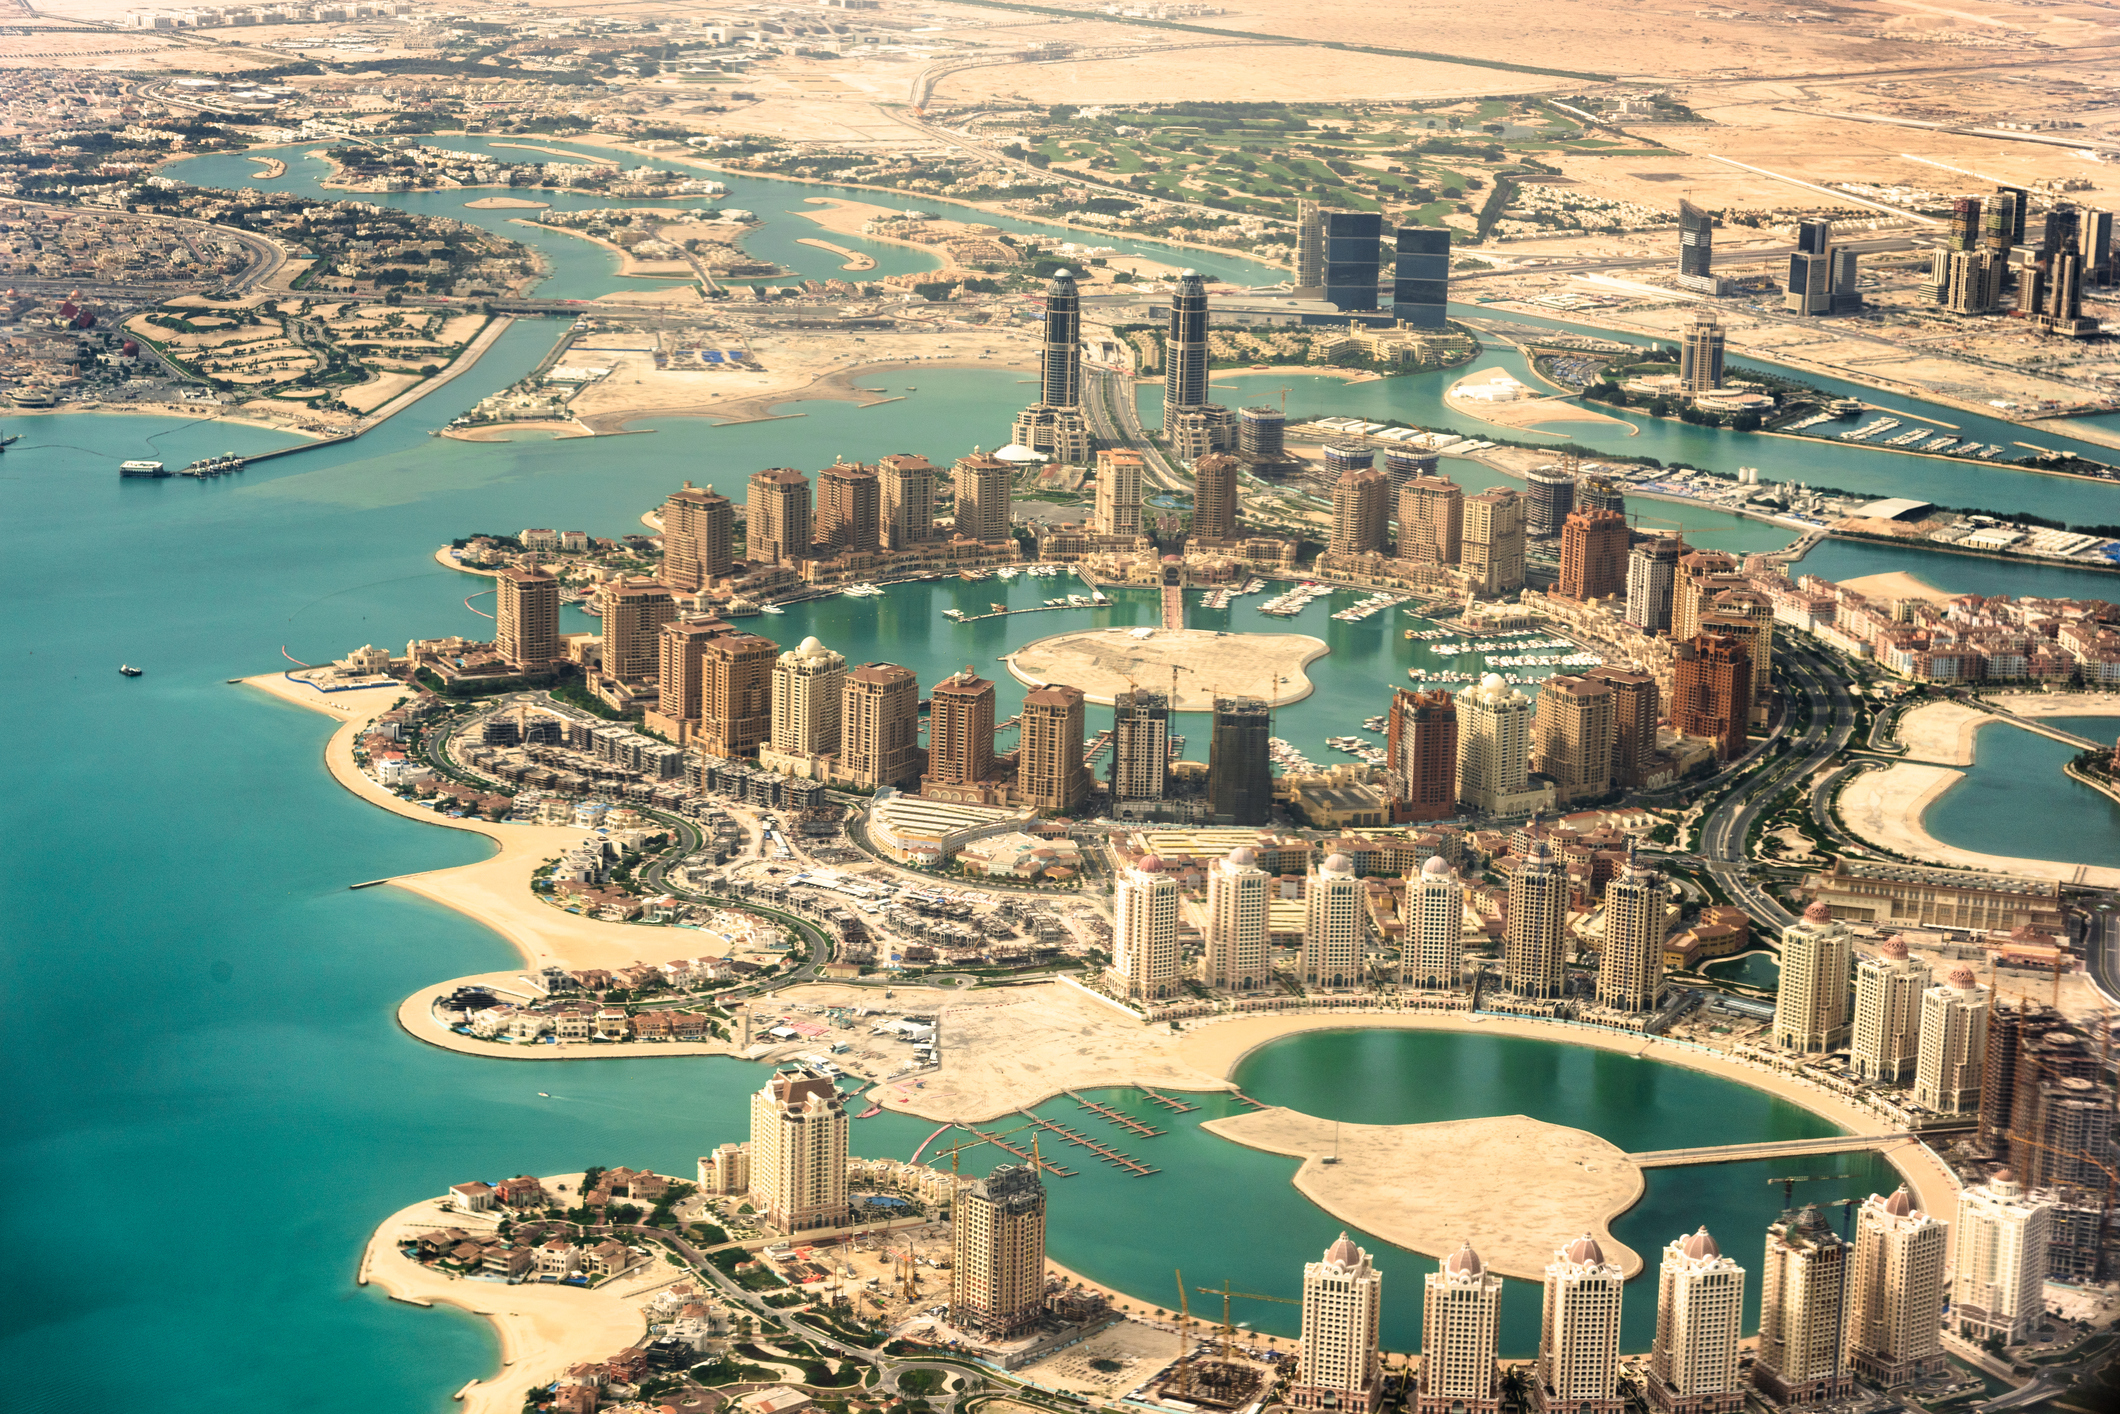 The Pearl of Doha, Qatar